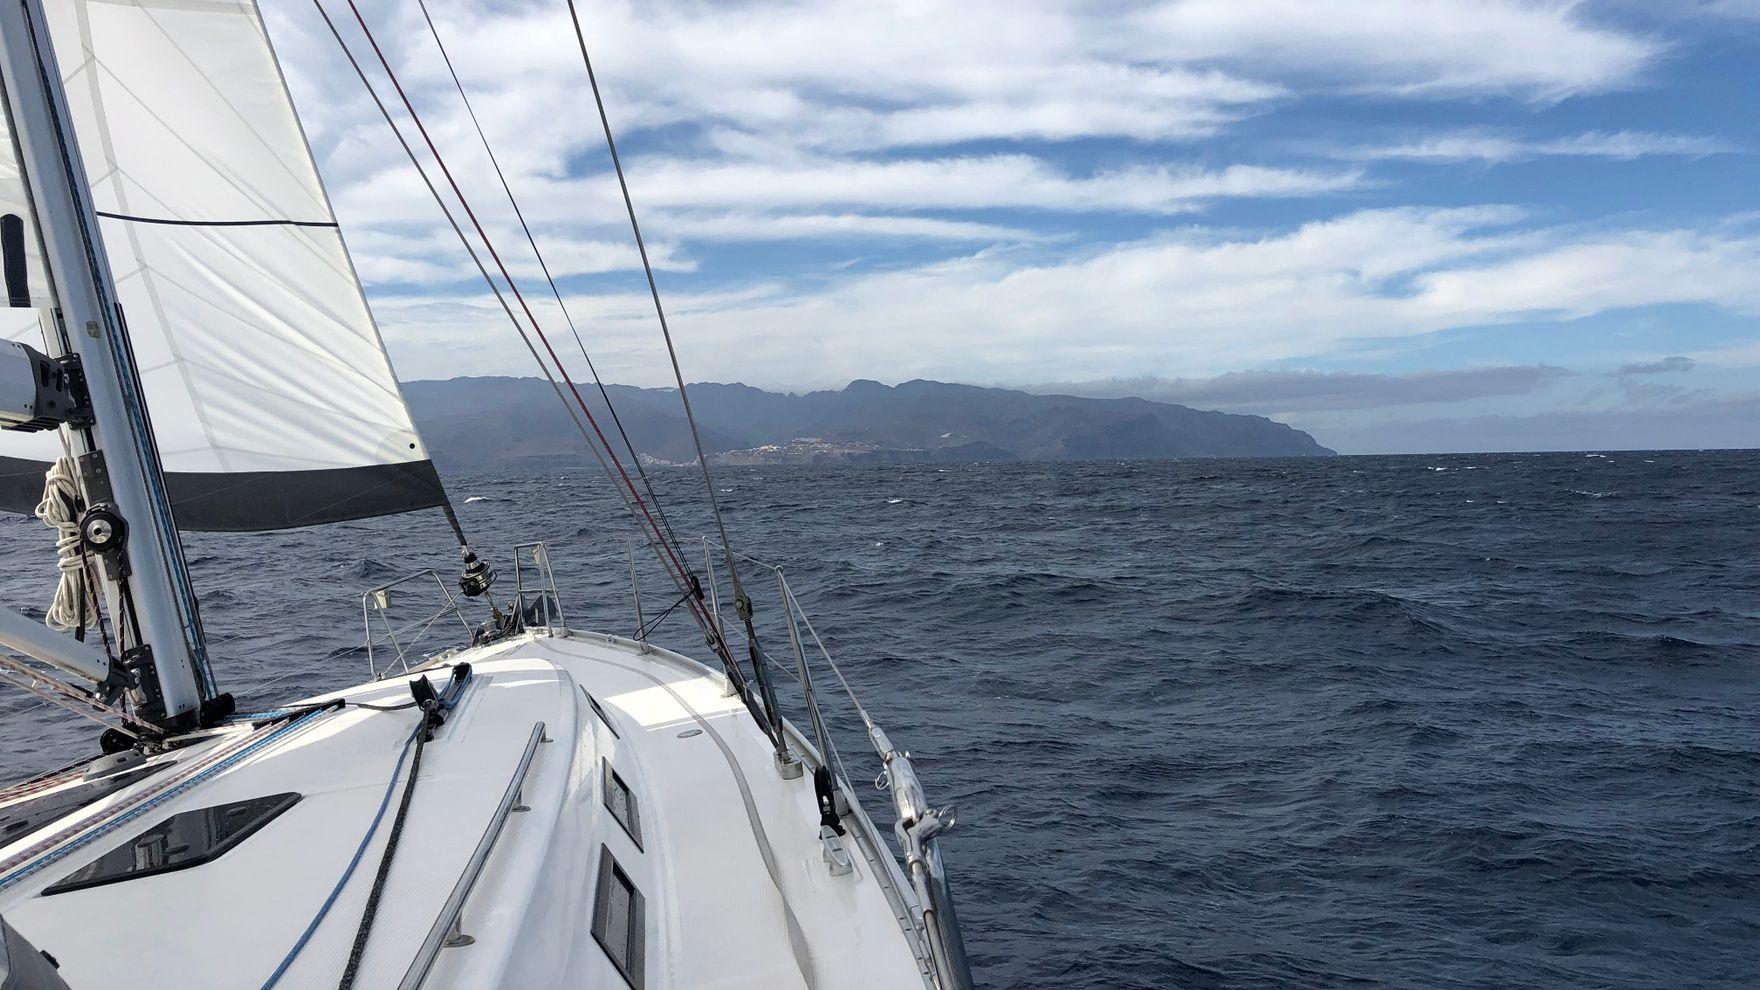 Canaries, 3 islands in 10 days: Tenerife — La Gomera — La Palma — Tenerife. 240 nm